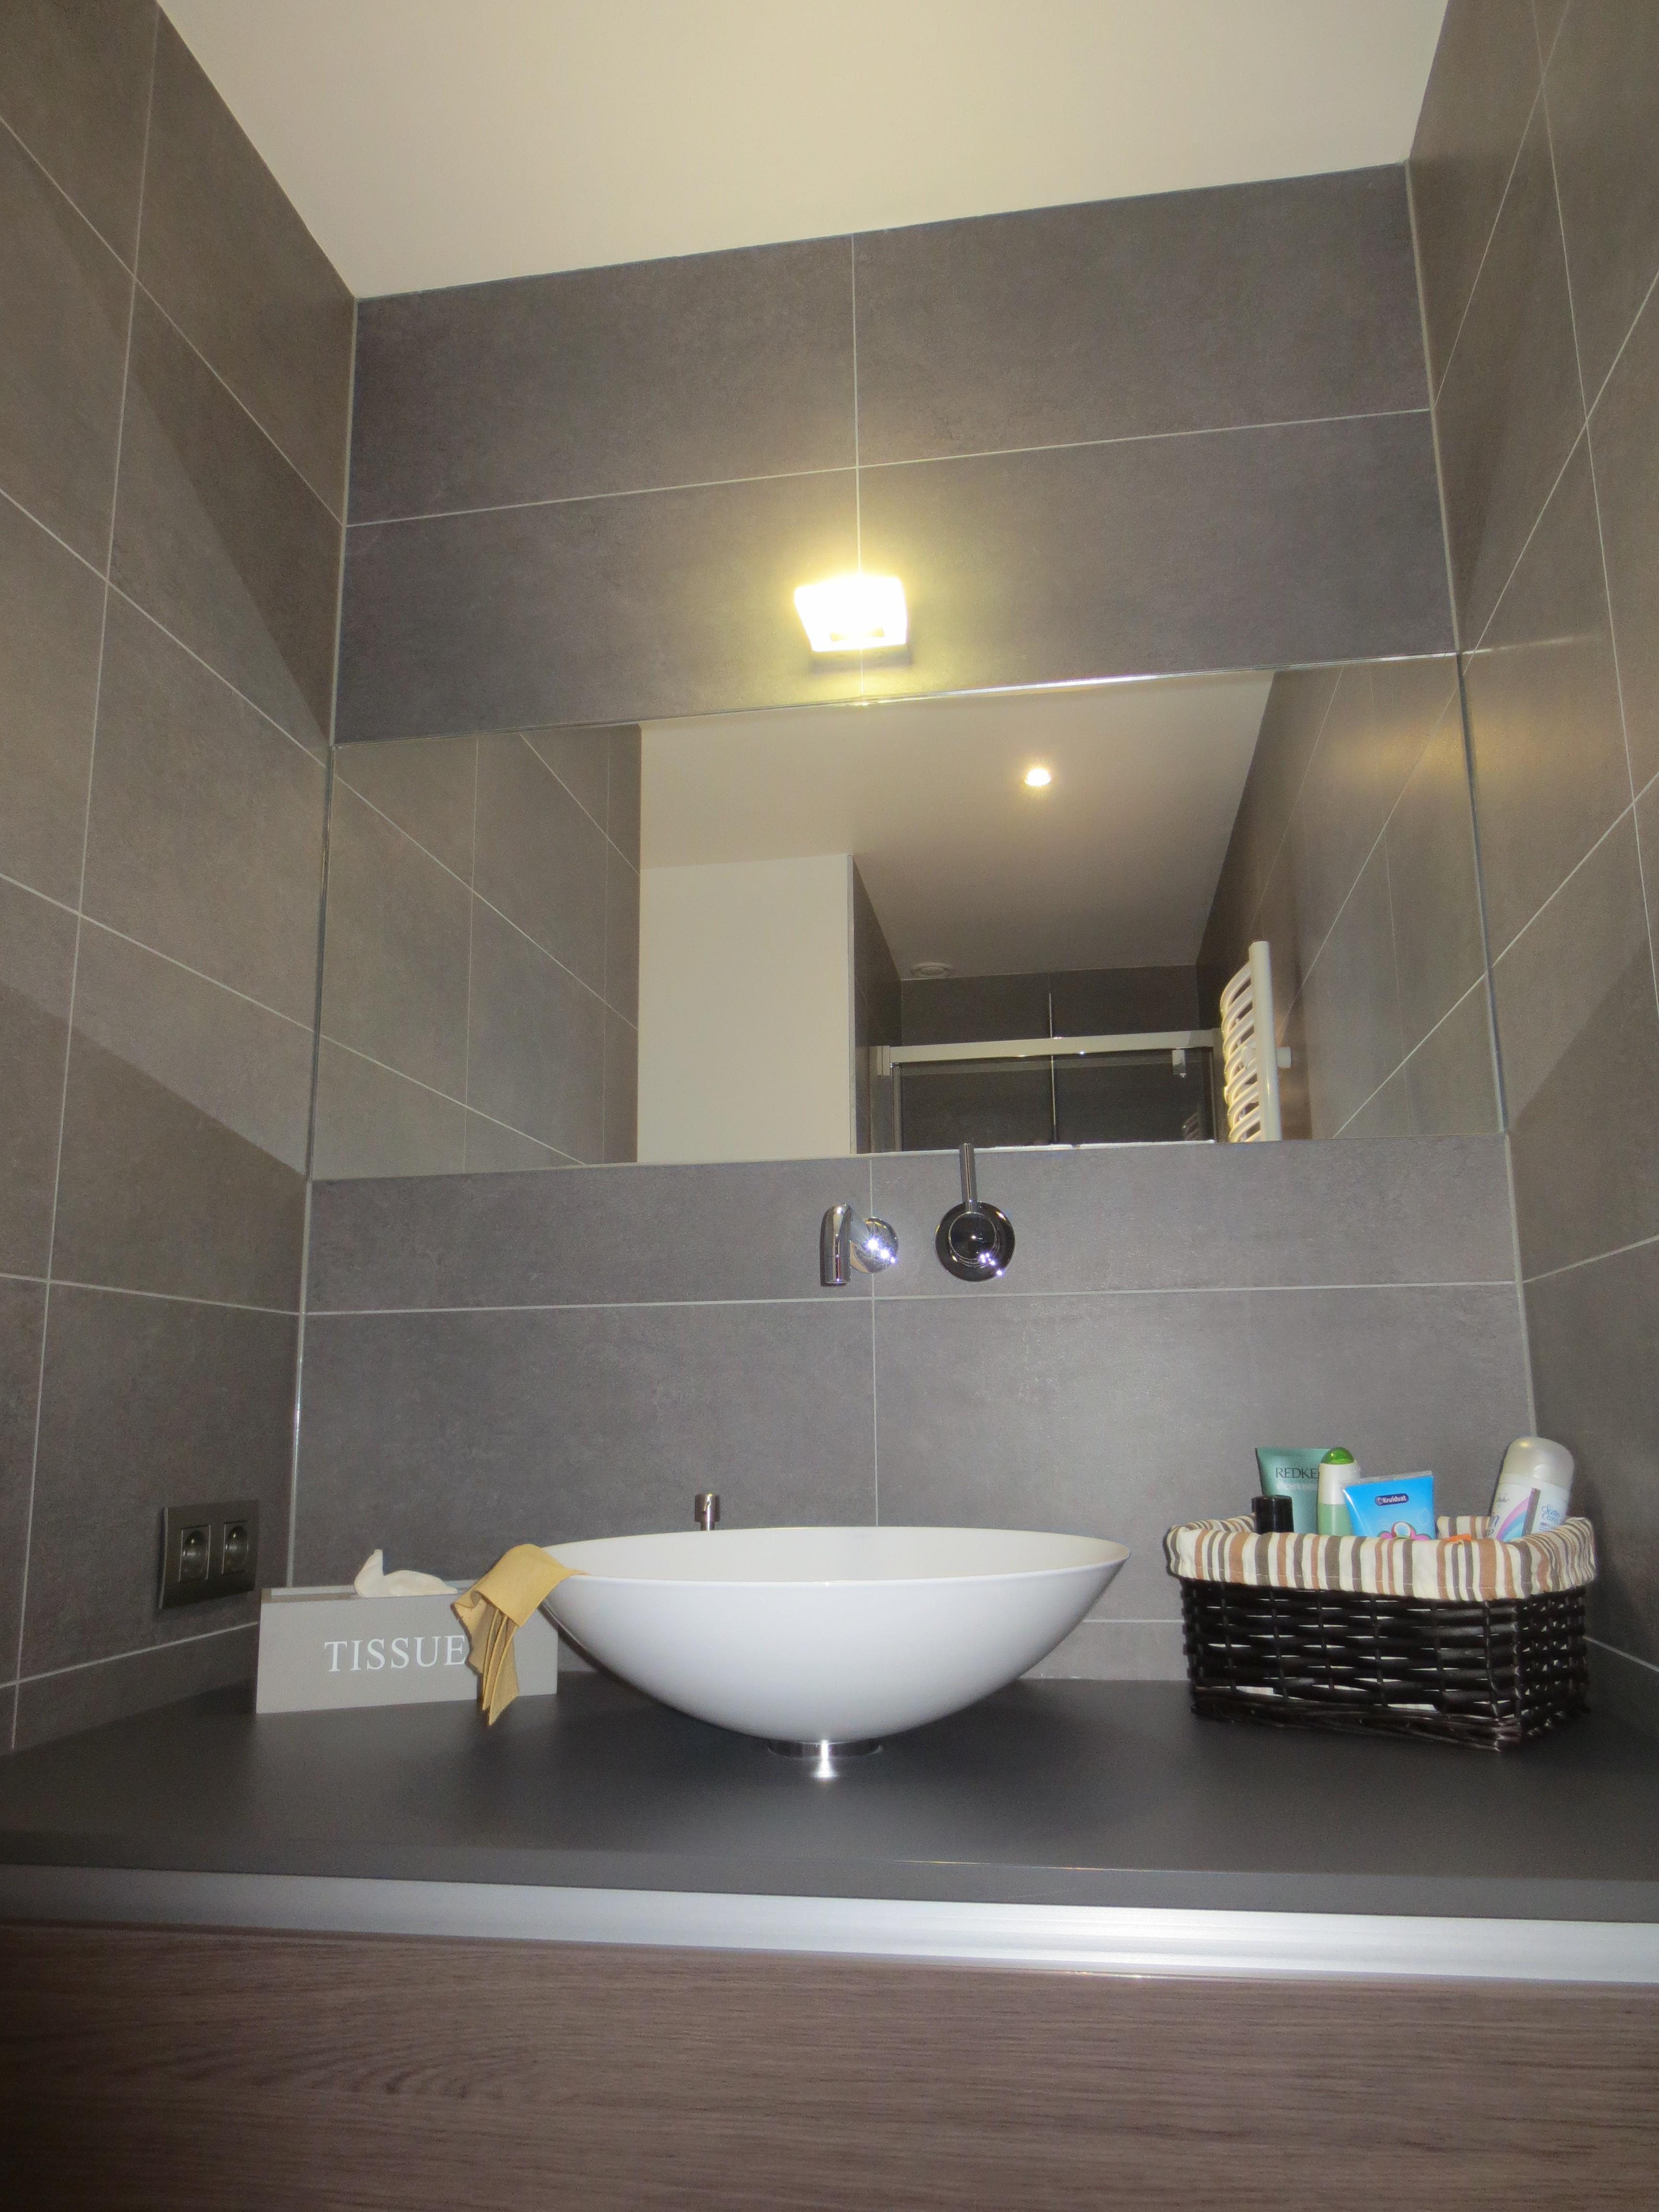 Afgewerkte kleine badkamer